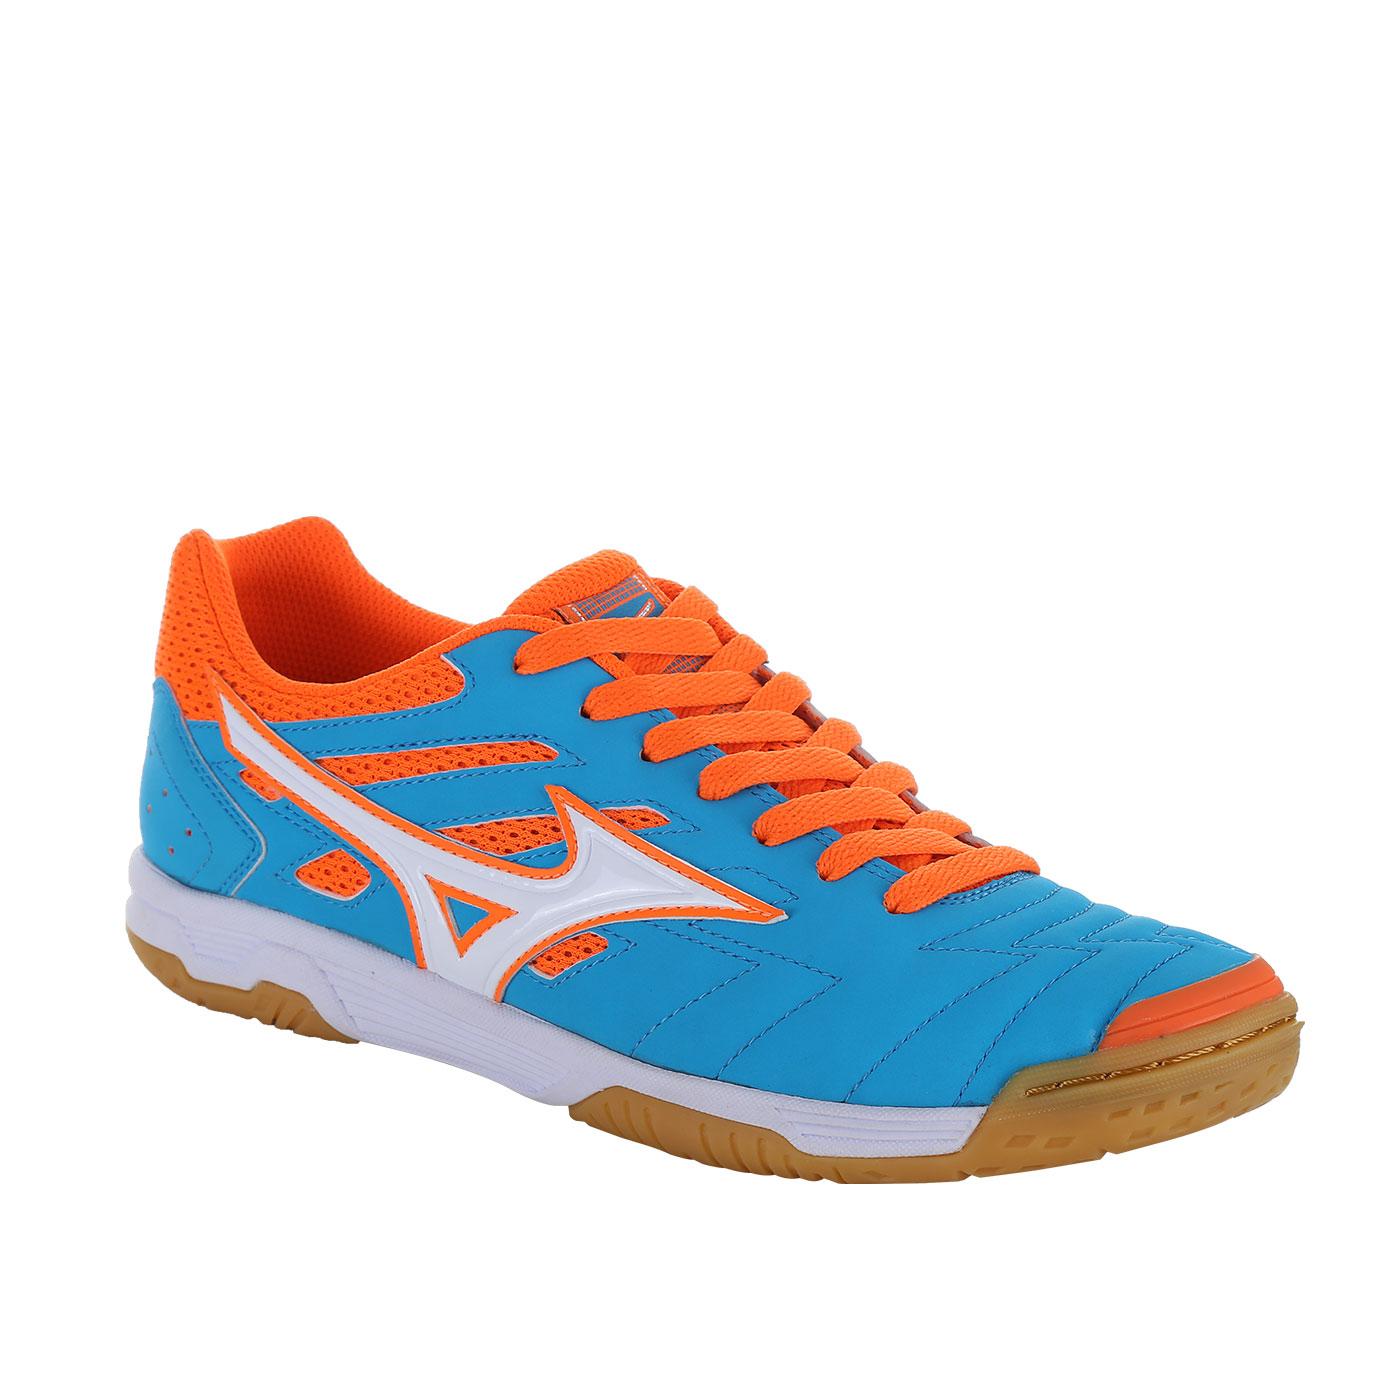 Harga Baru Sepatu Futsal Q1ga175201 Mizuno Sala Classic 2 In Biru  Ber Kualitas Putih